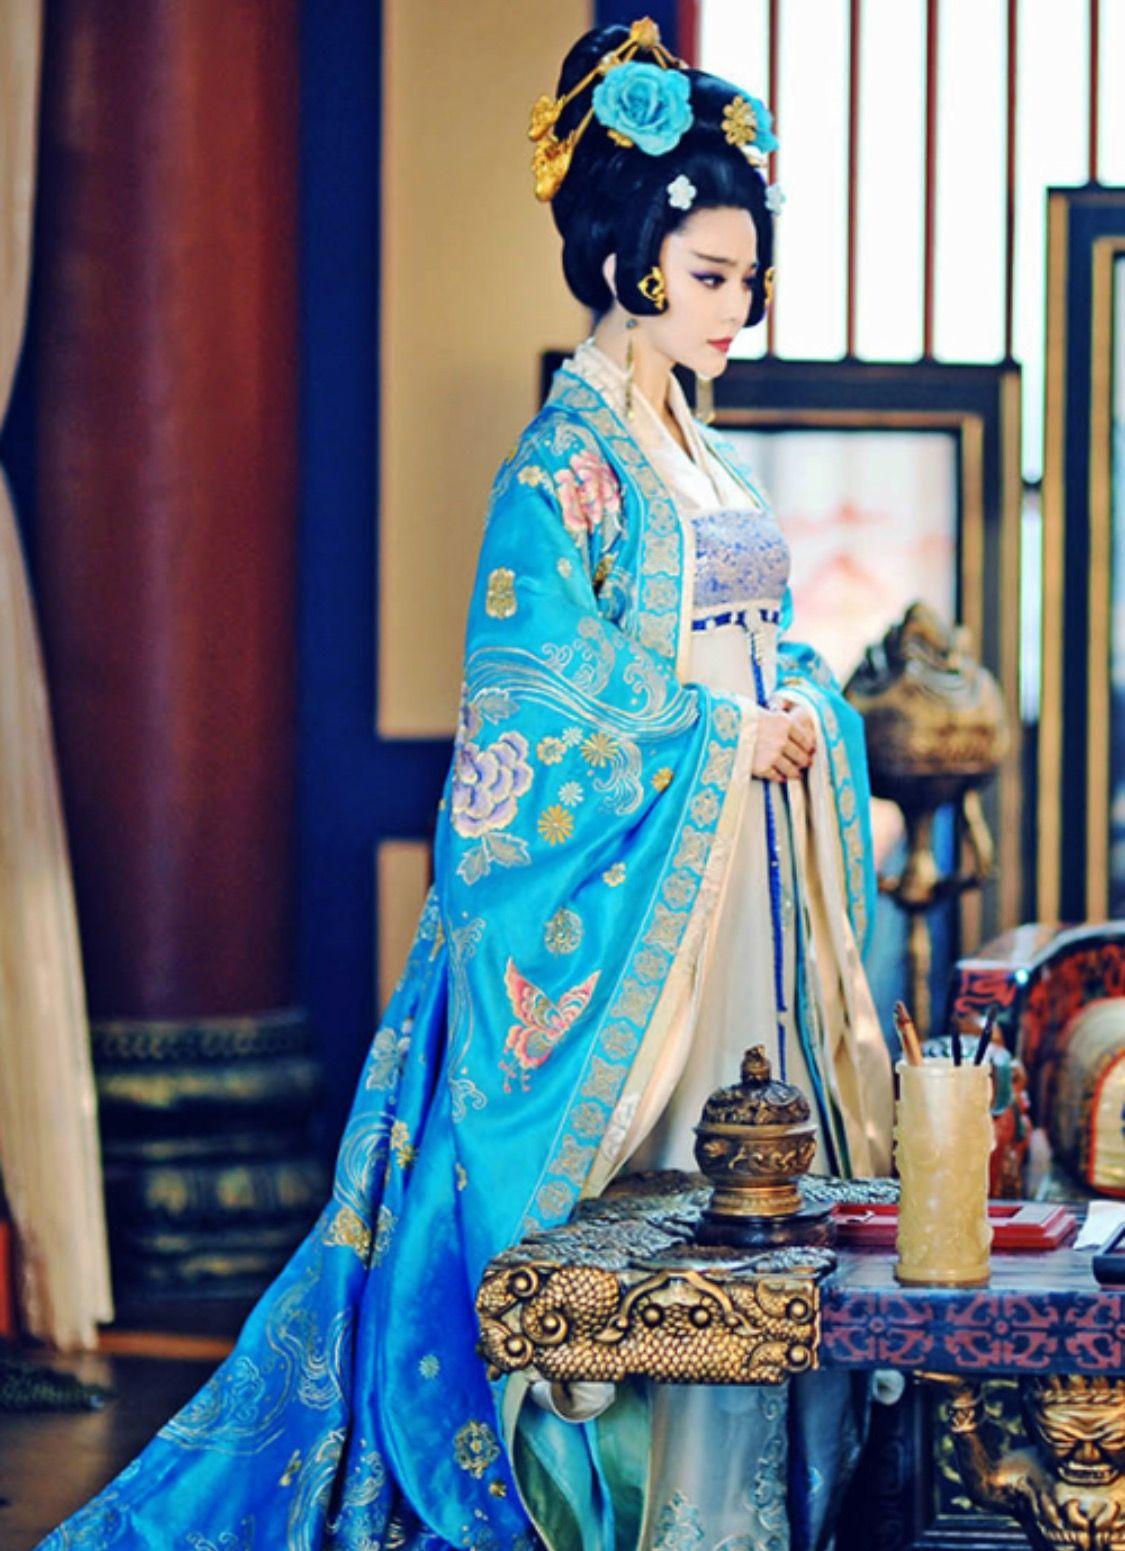 Pin by JiminieDeChimChimgod on Tang Dynasty\\Ancient China ...